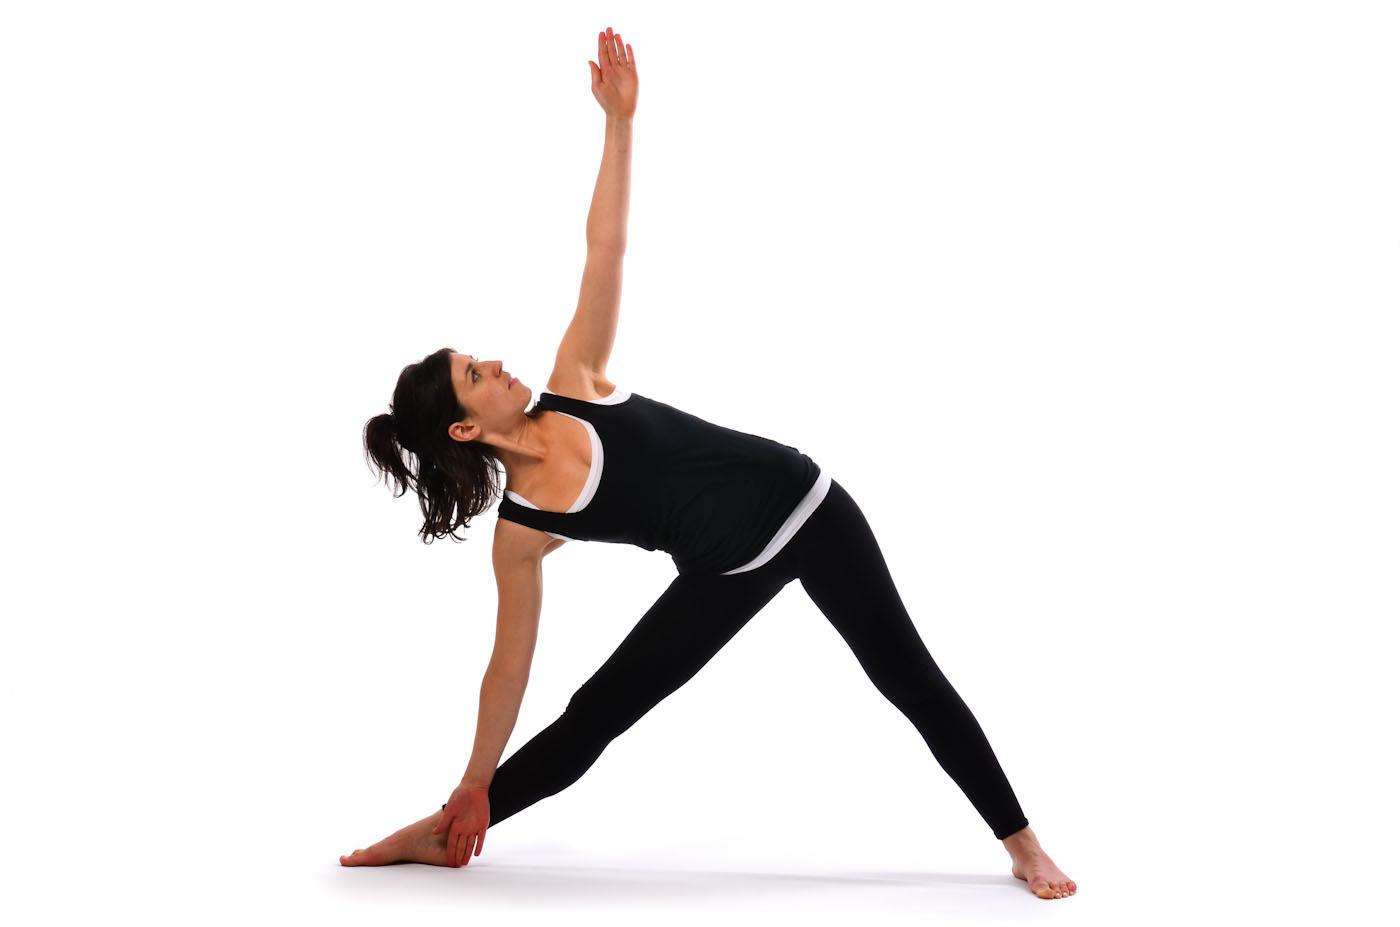 Simple Yoga Poses | Med-Health.net